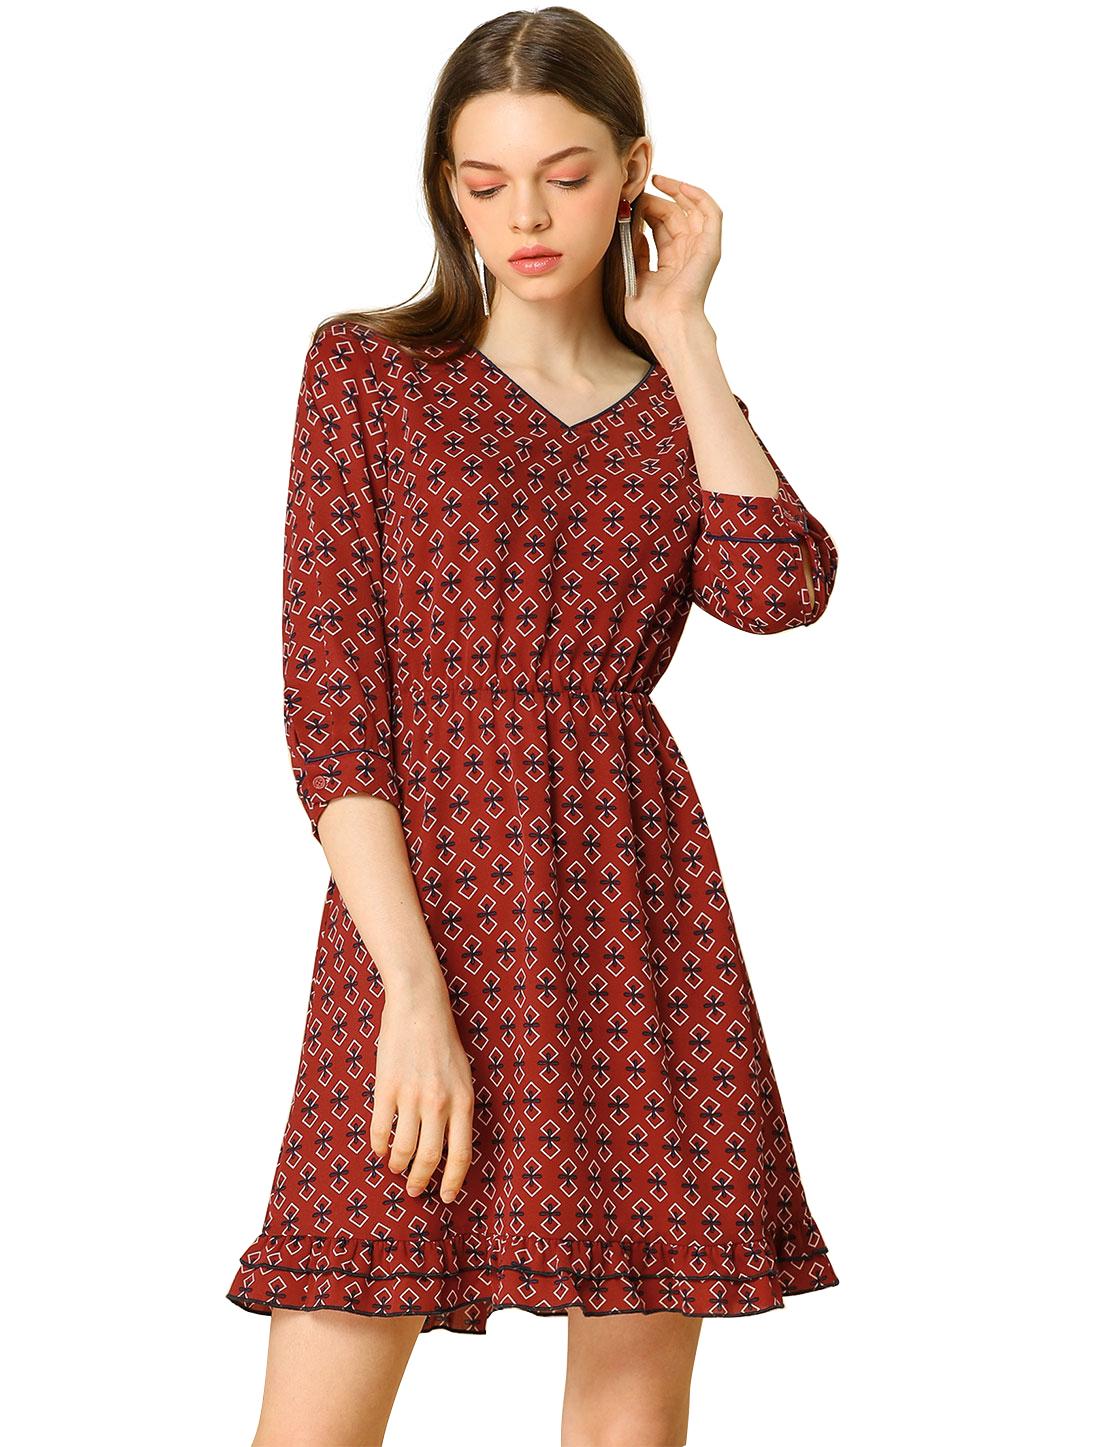 Women's 3/4 Sleeve V Neck Ruffle Hem Geometric Motifs Flare Chiffon Dress Red XS